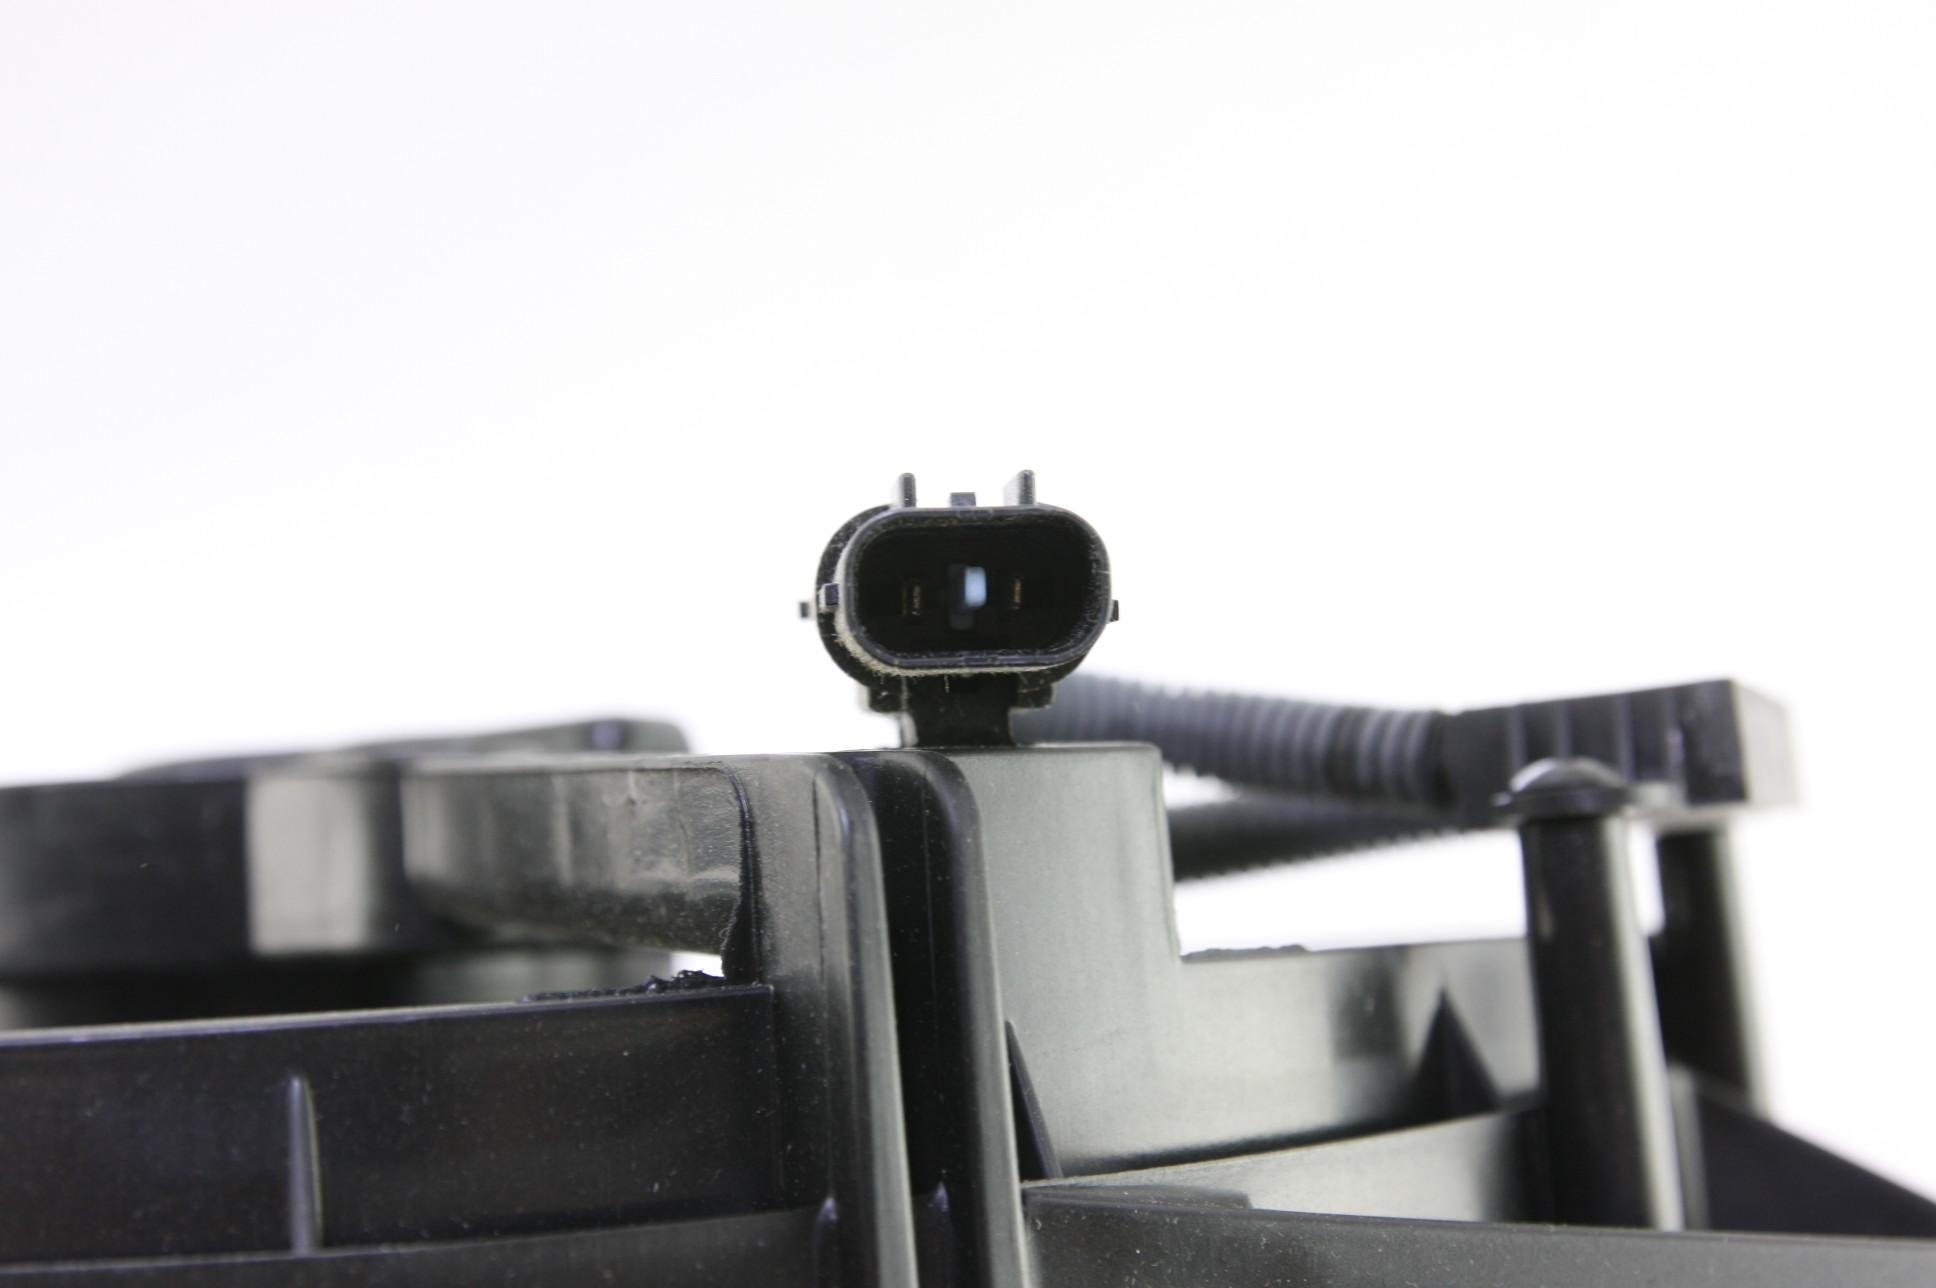 ~ New Kia OEM 977301G000 Kia Rio Radiator Condenser Fan Motor Free Shipping - image 7